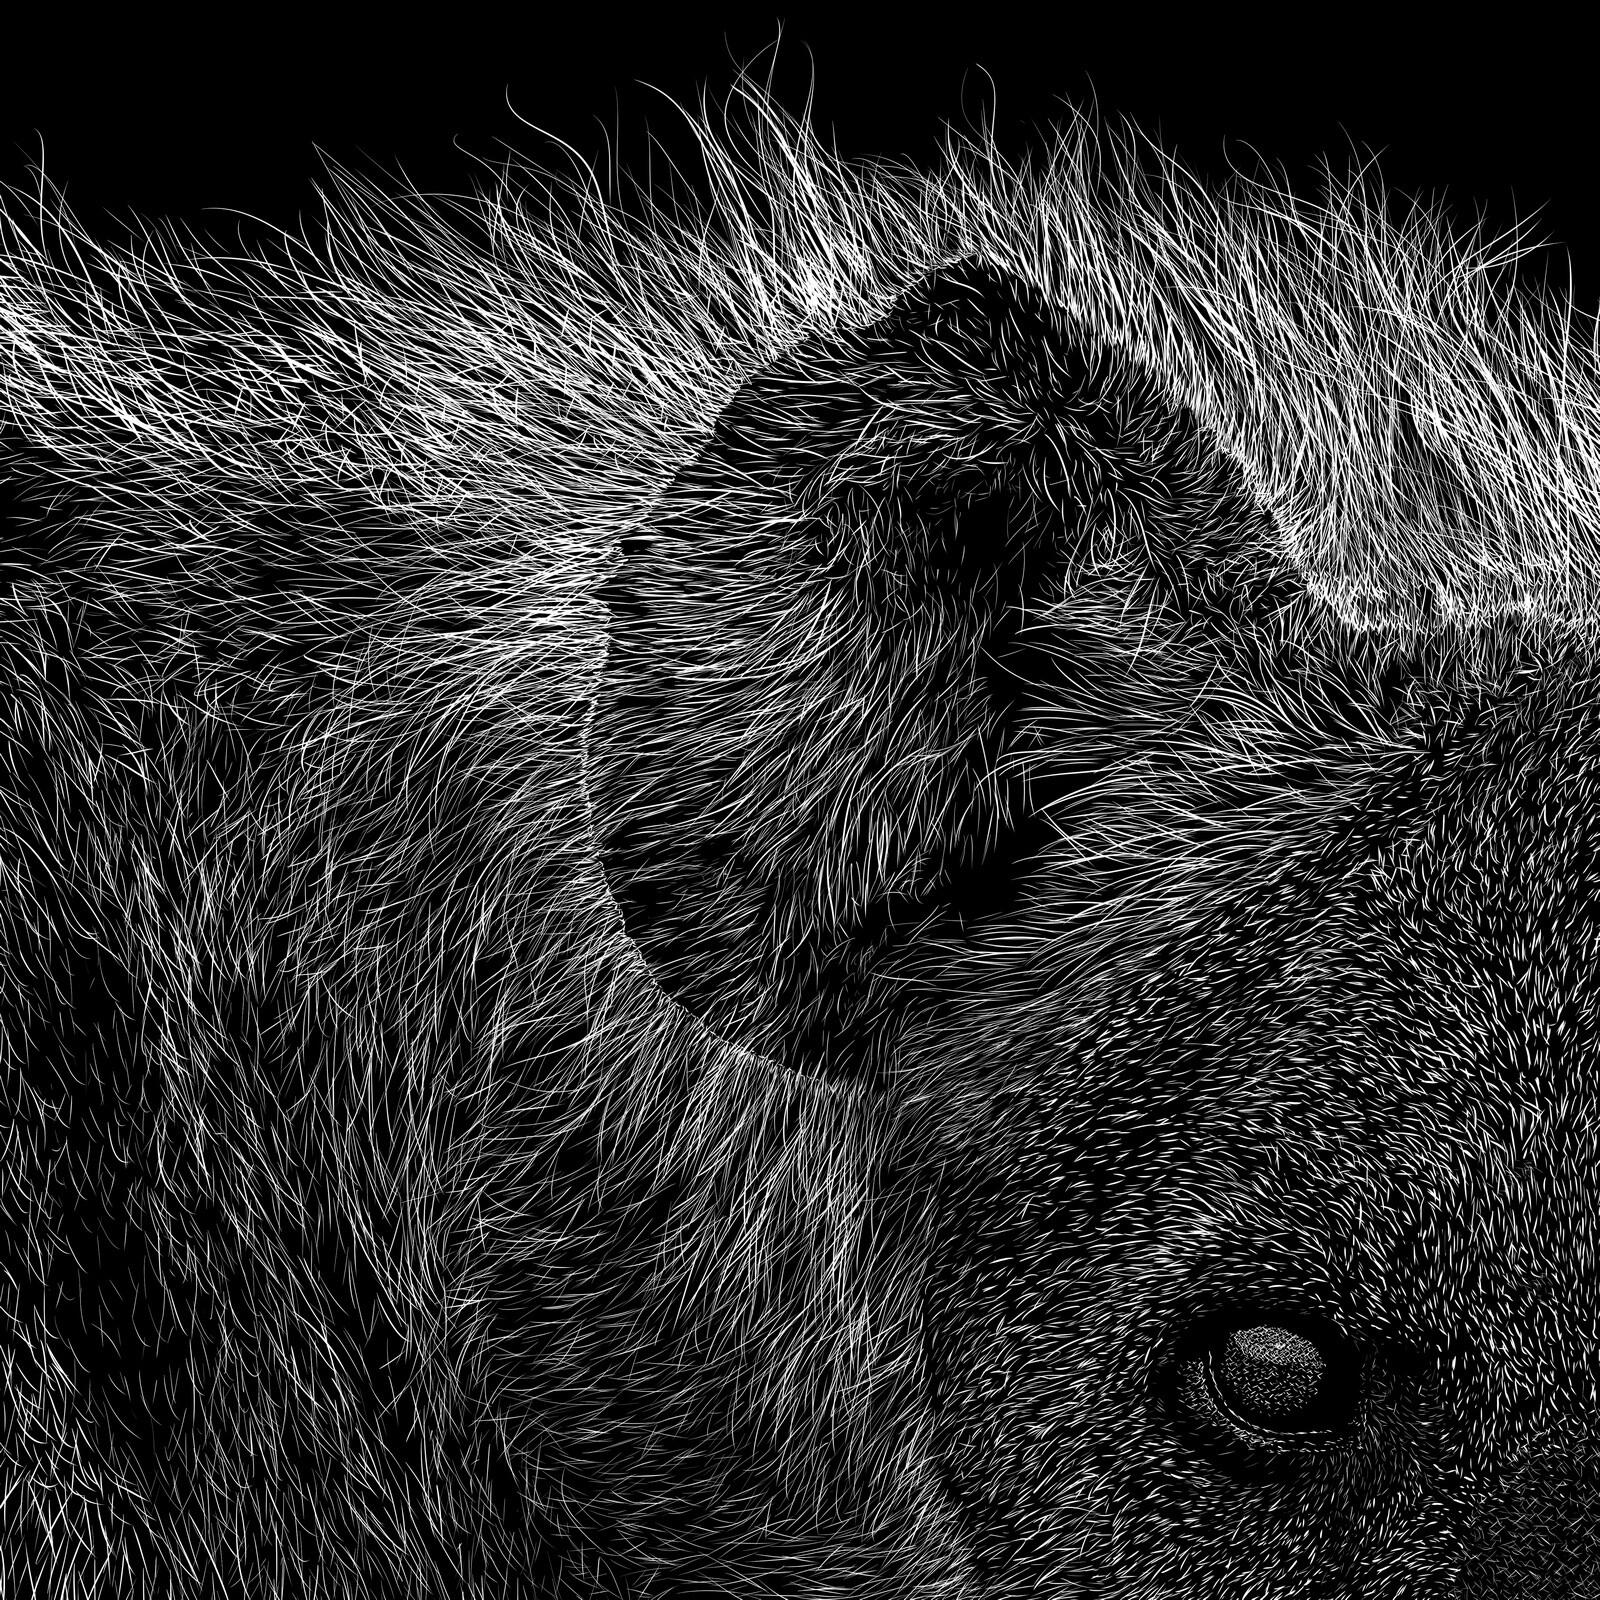 hyaenidae, eye-ear close-up Digital scratchboard, feb. 2019